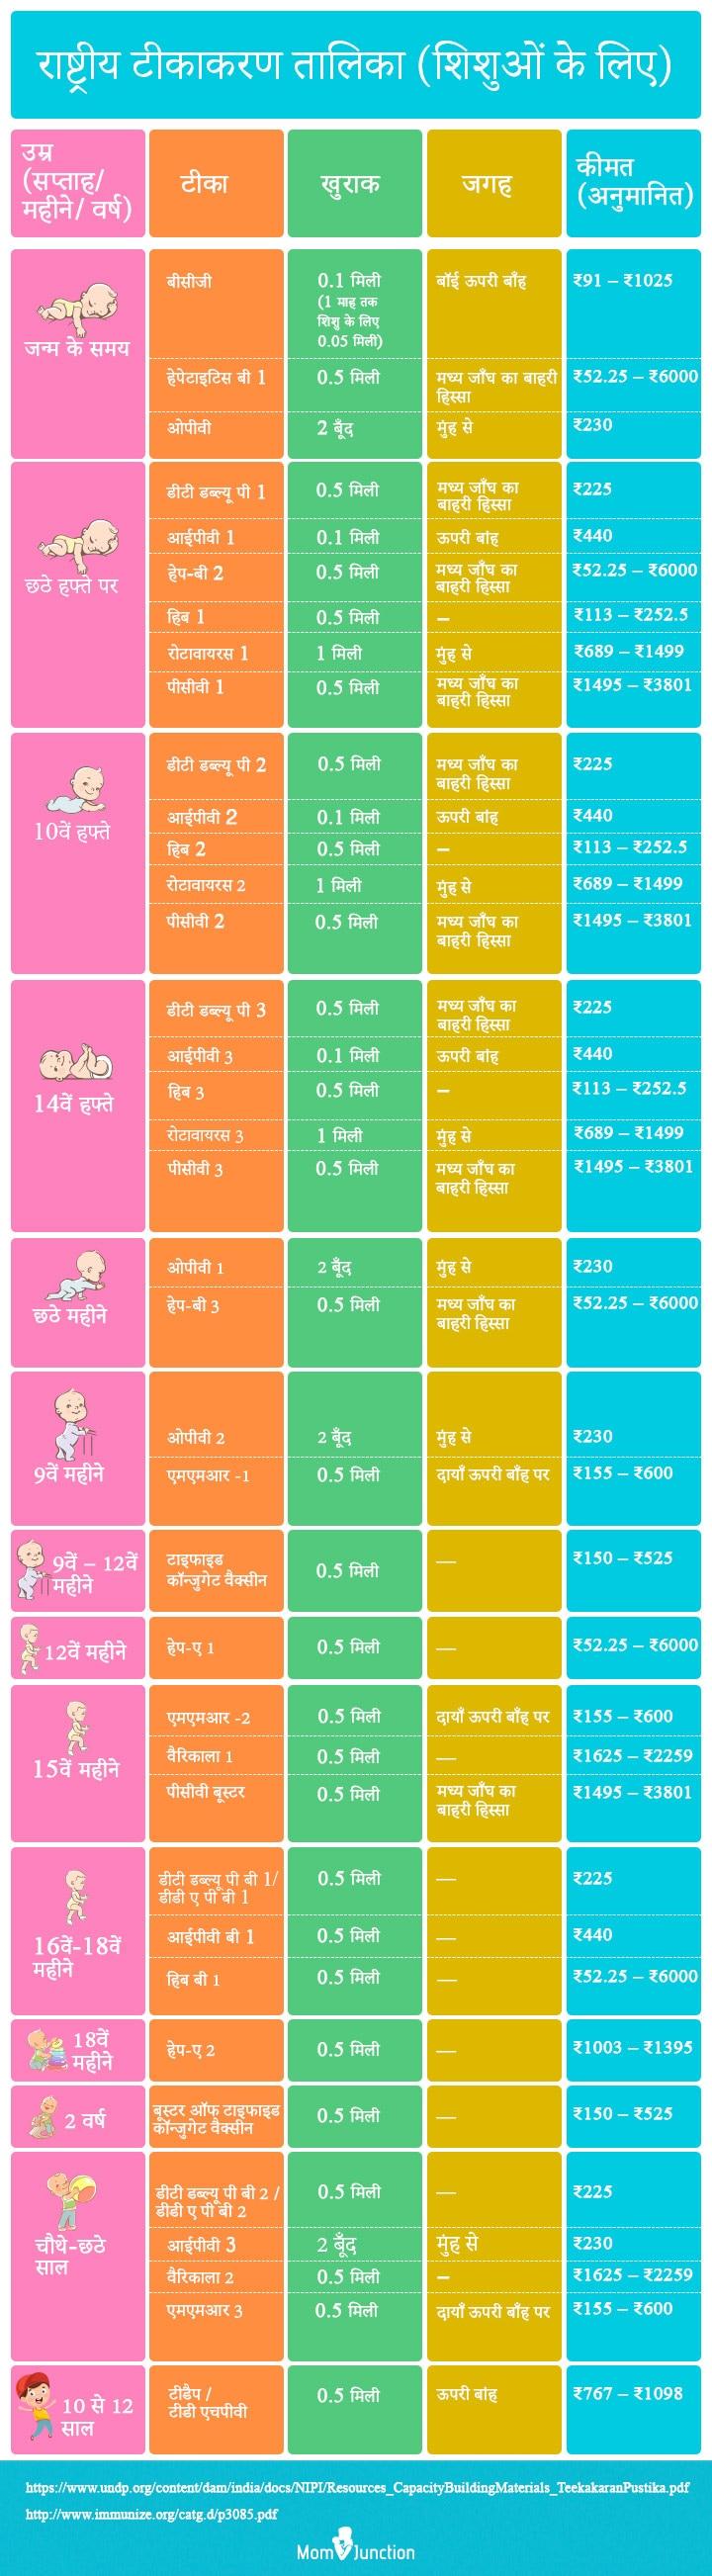 shishu vaccination chart